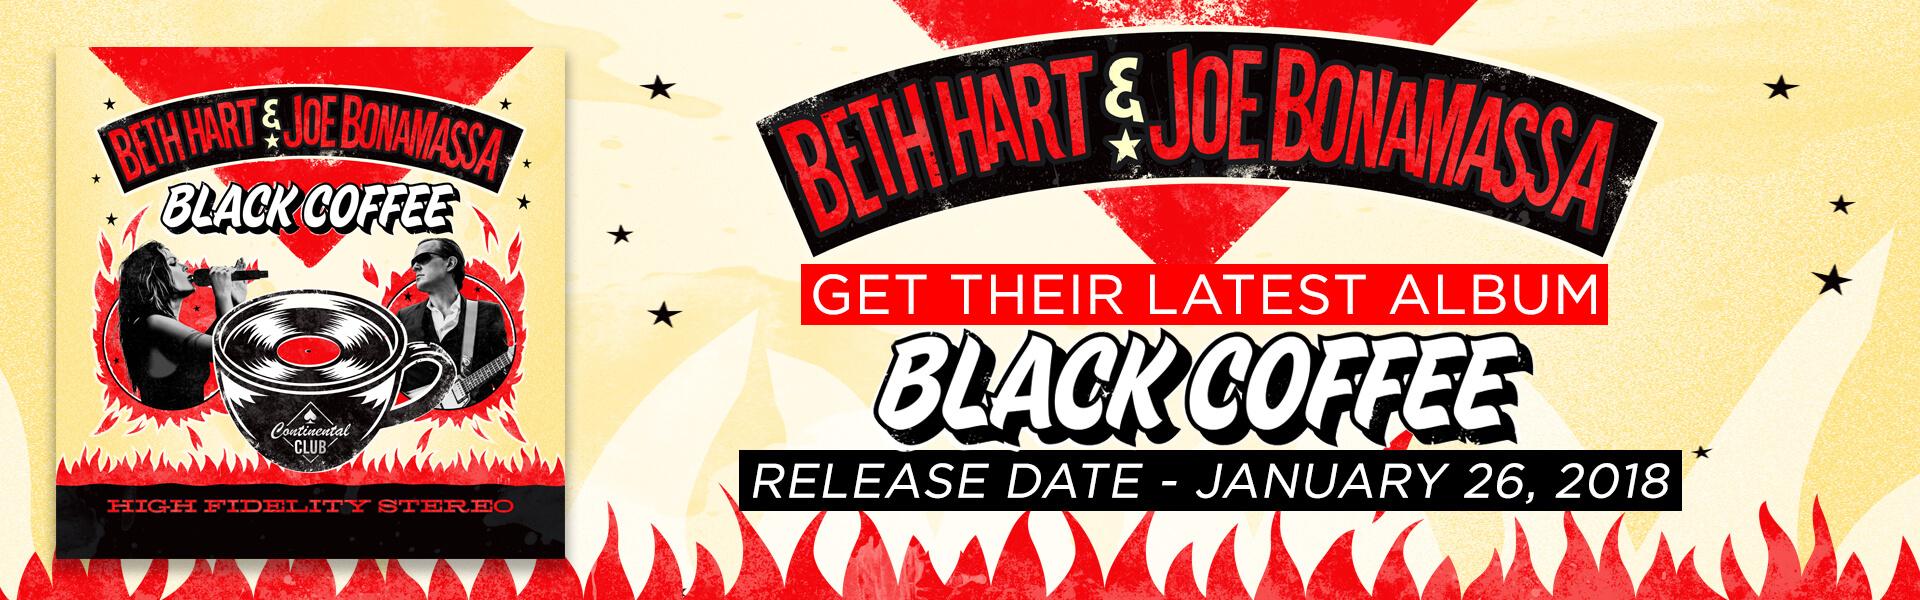 "Free Download Joe Bonamassa & Beth Hart ""Black Coffee"""